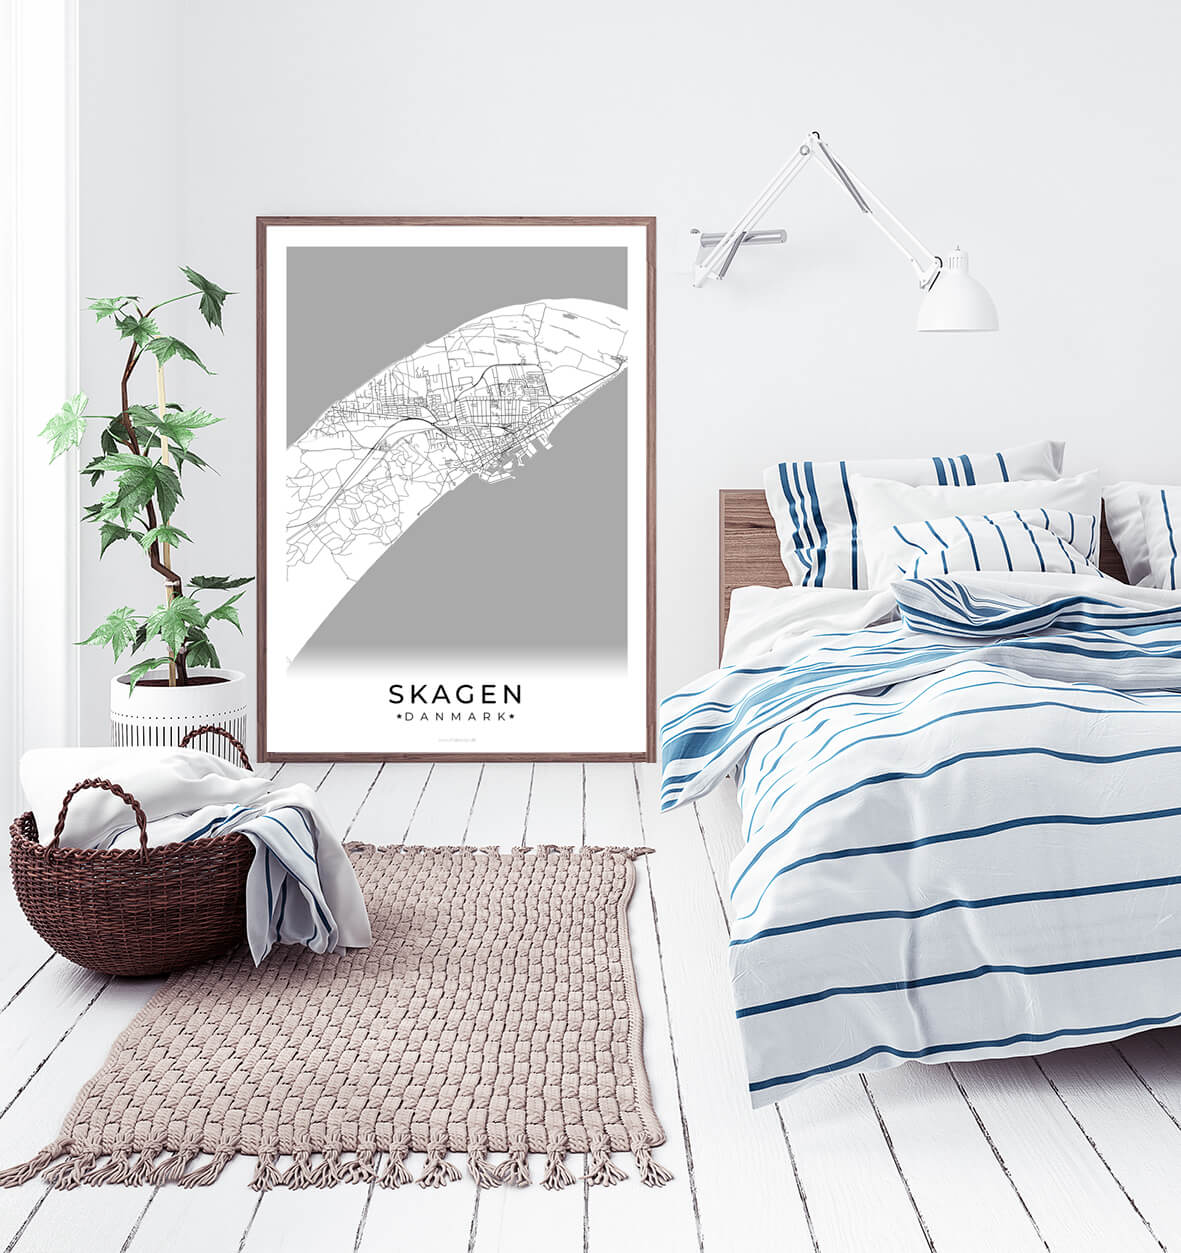 Skagen-hvid-byplakat-2